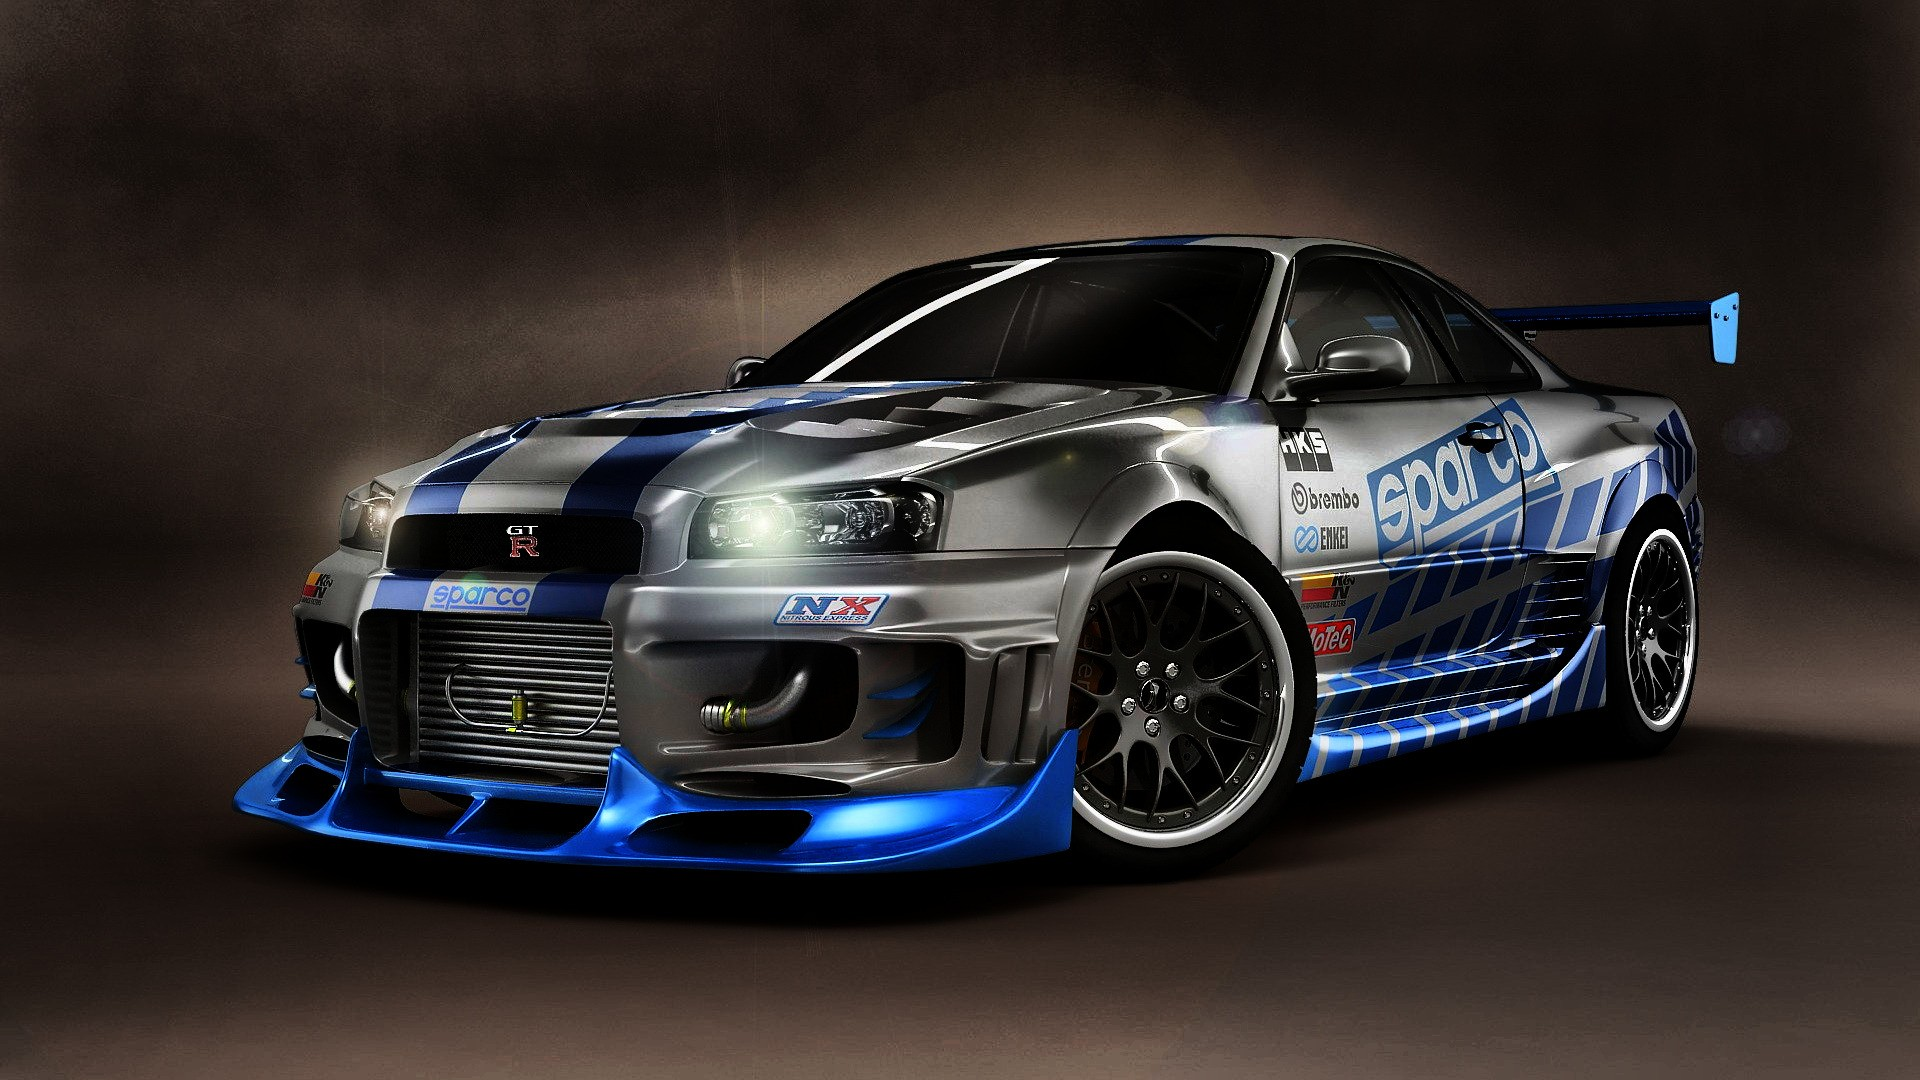 Nissan Skyline Gtr Car Wallpaper 1080p HD Resolutions Car 1920x1080